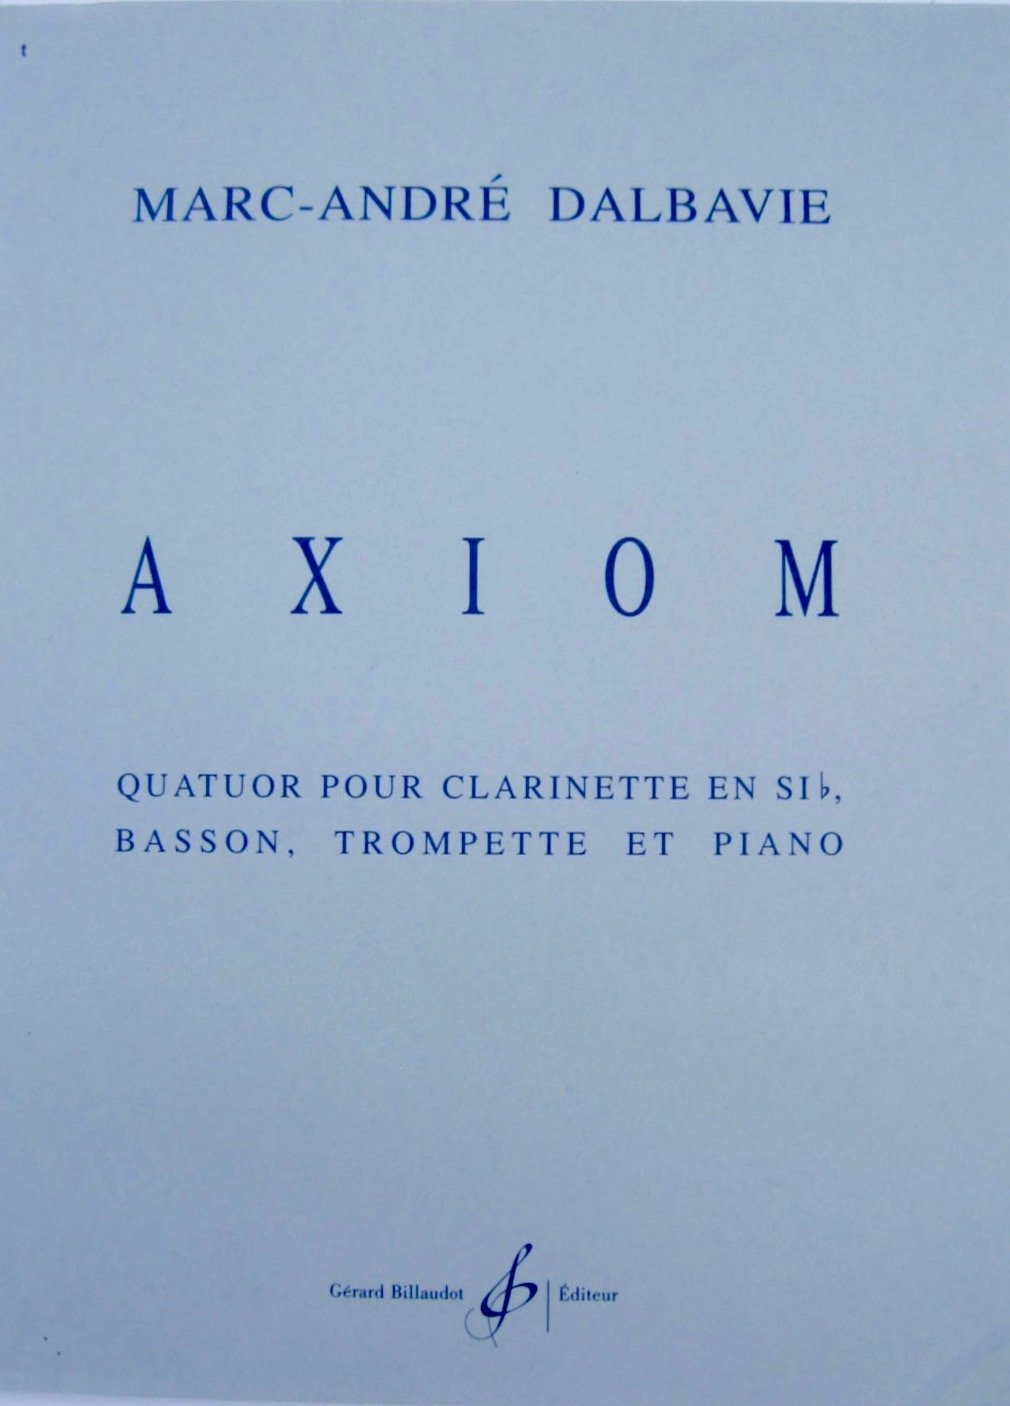 Axiom Quatuor for Clarinet, Bassoon, Trumpet and Piano